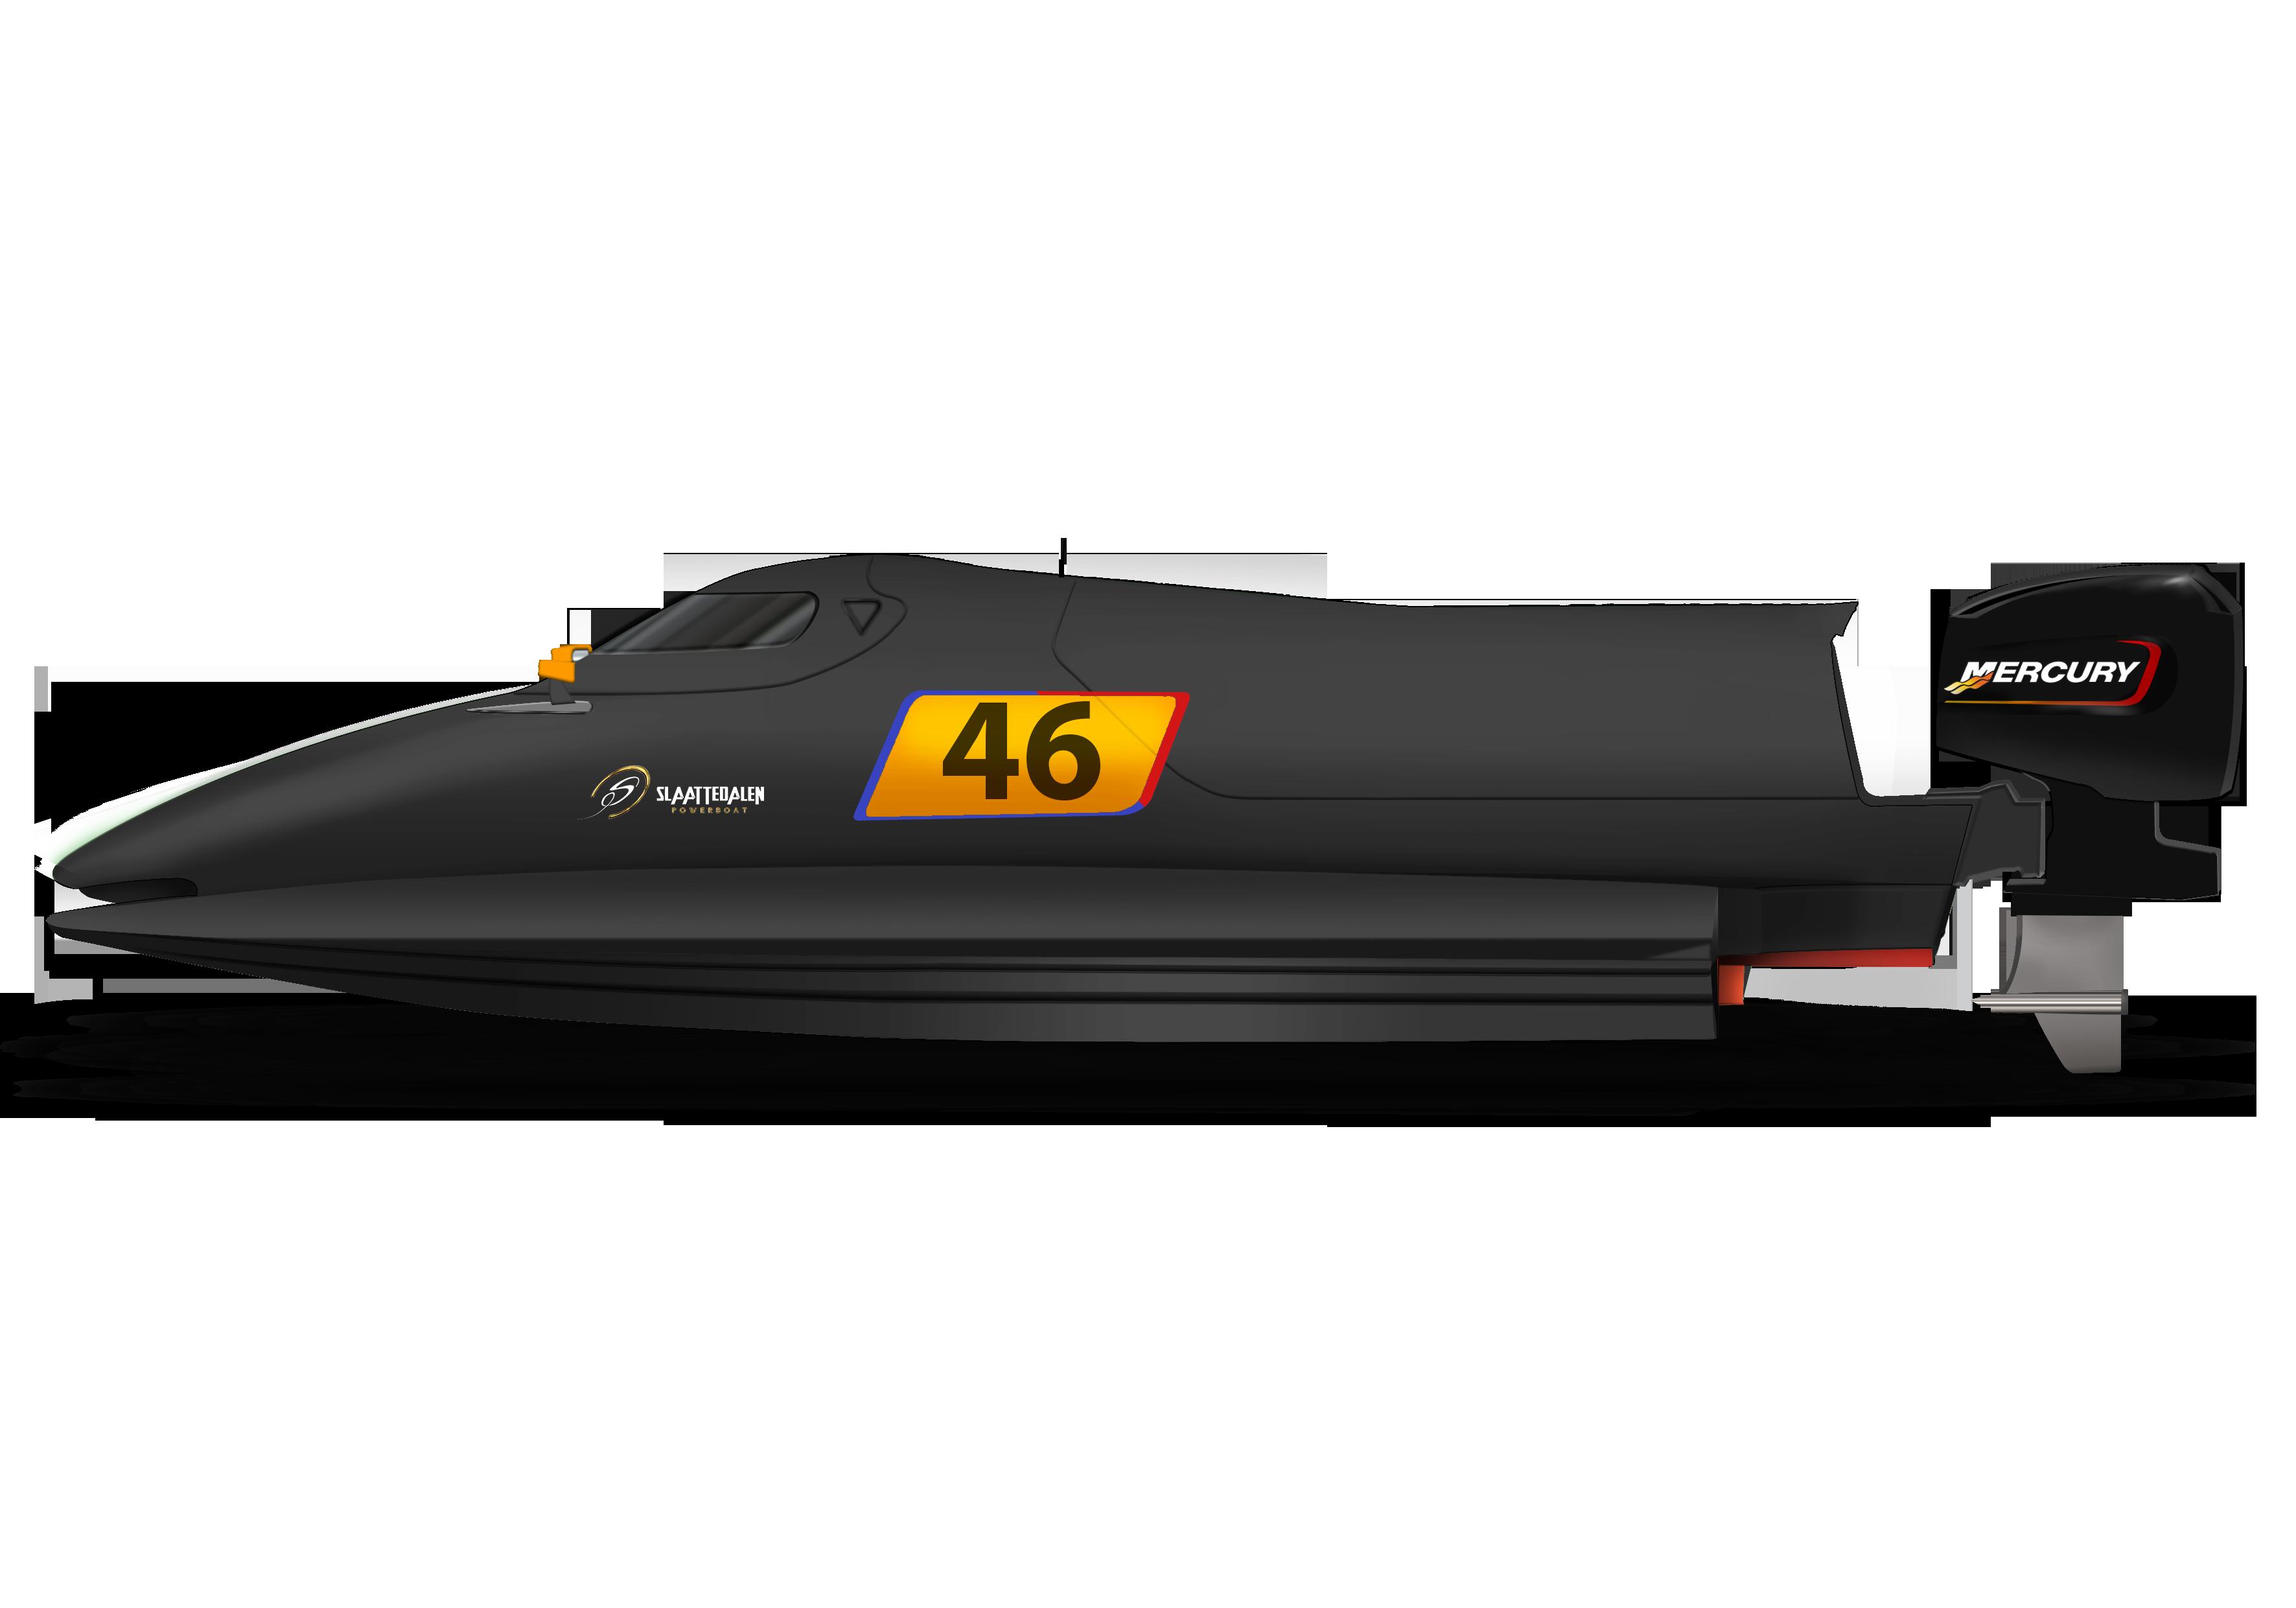 3D tegning av F2 racerbåt